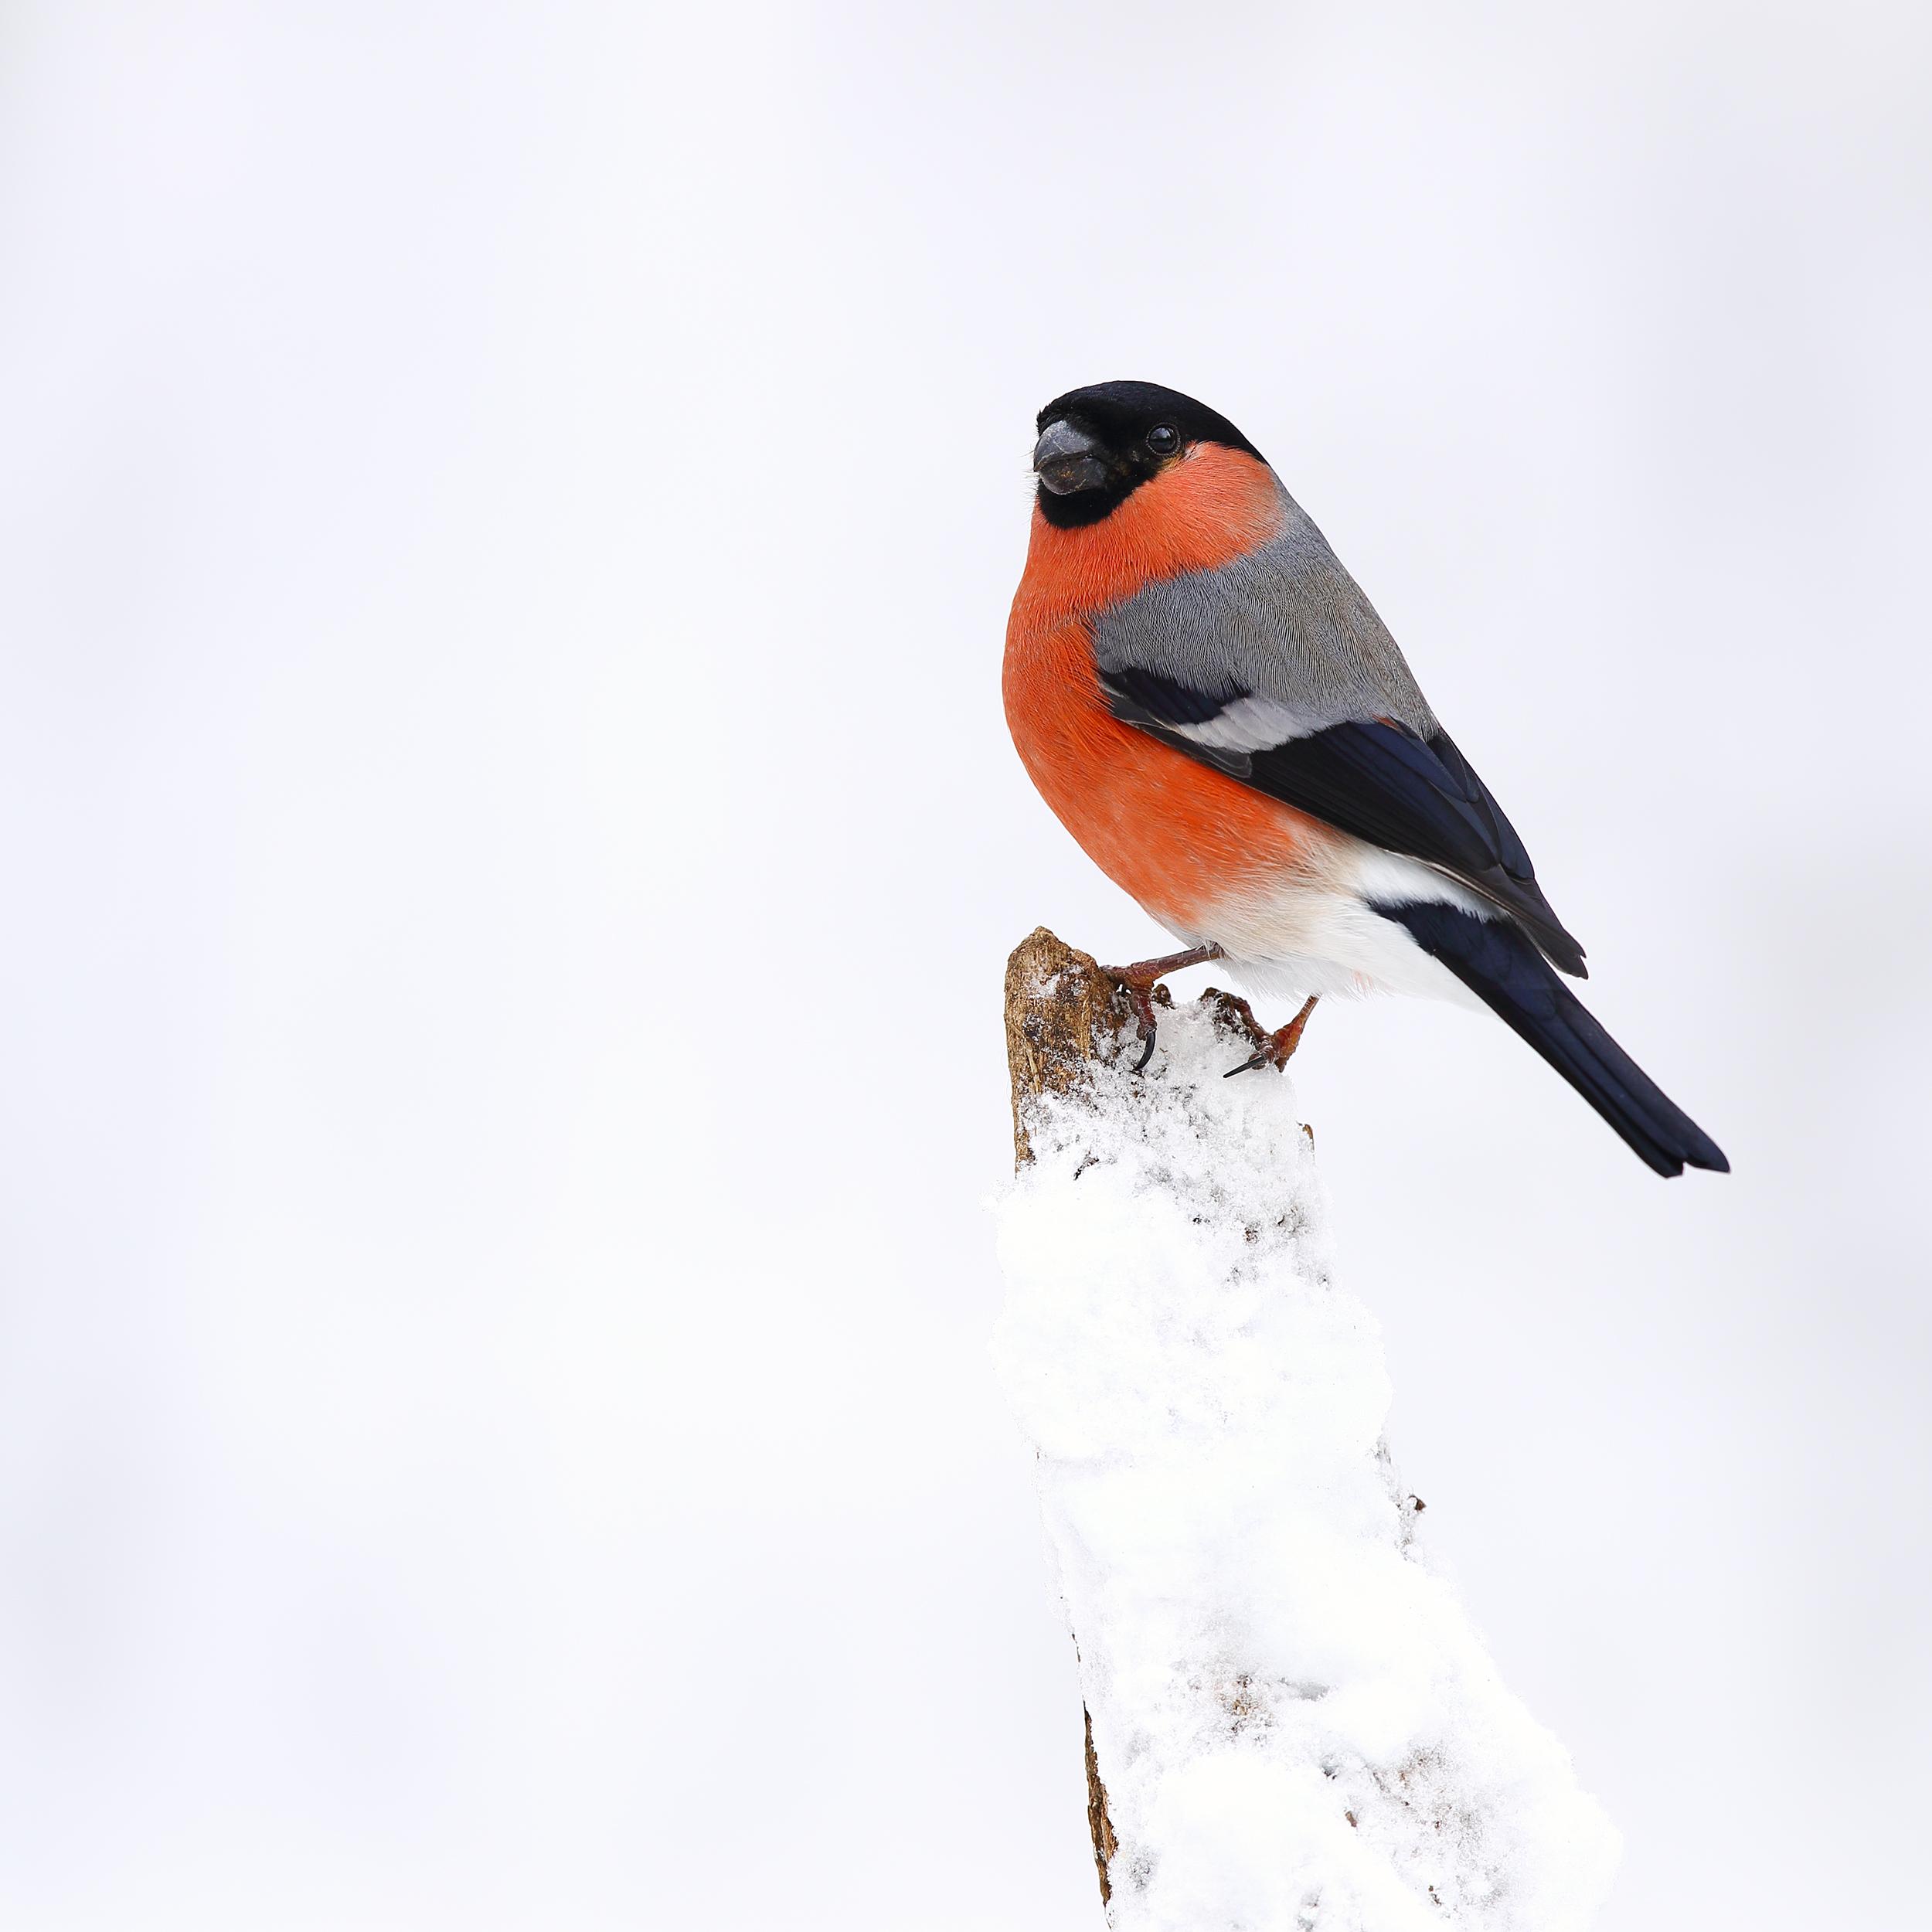 male, bullfinch, simon, roy, photography, winter, snow, woodland, hide